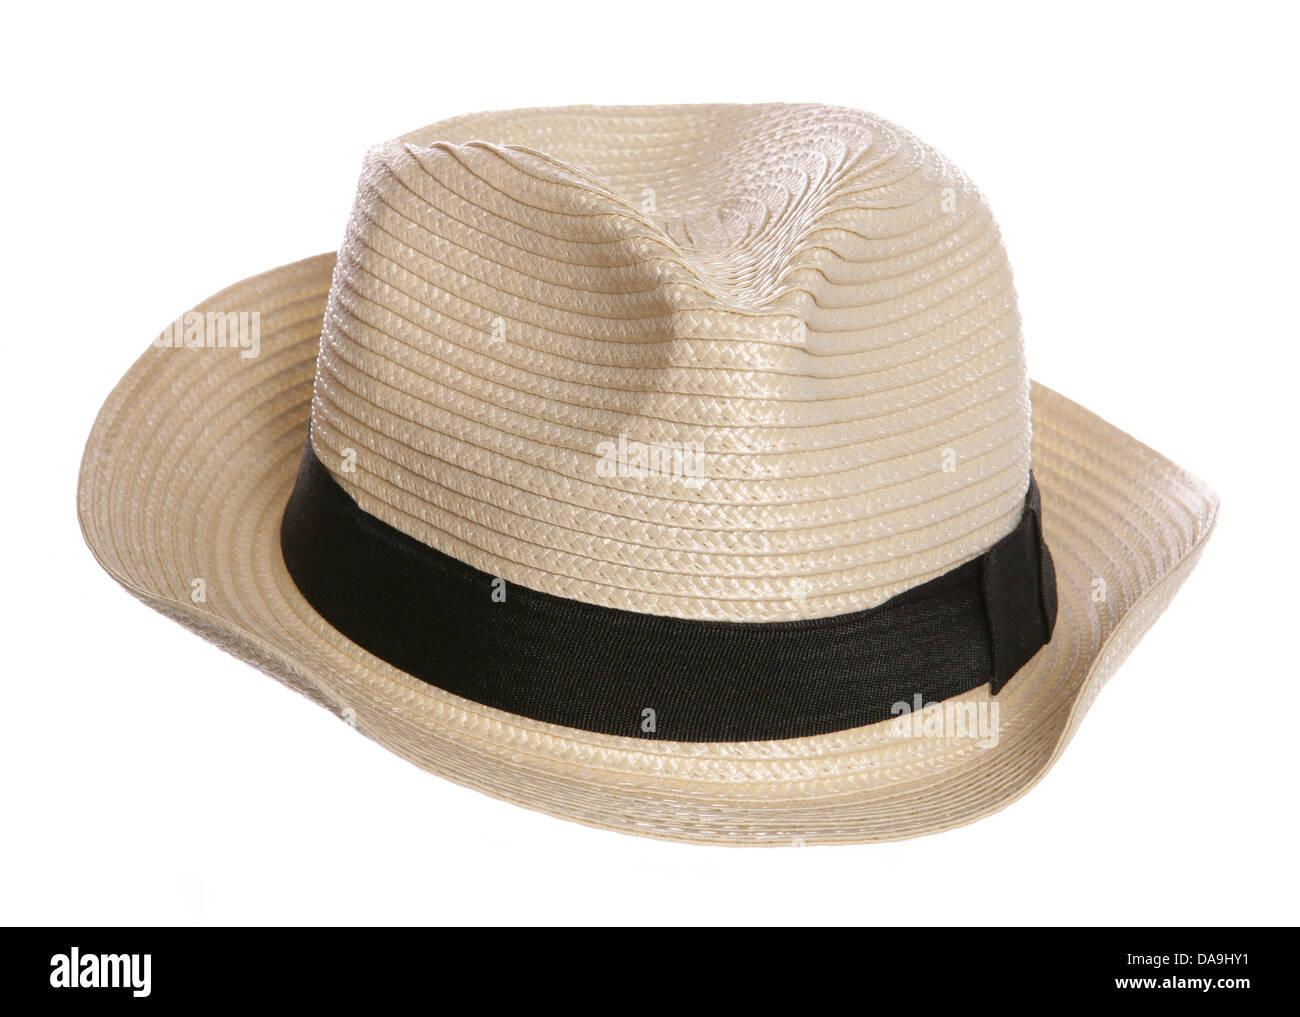 posh old mans hat studio cutout - Stock Image